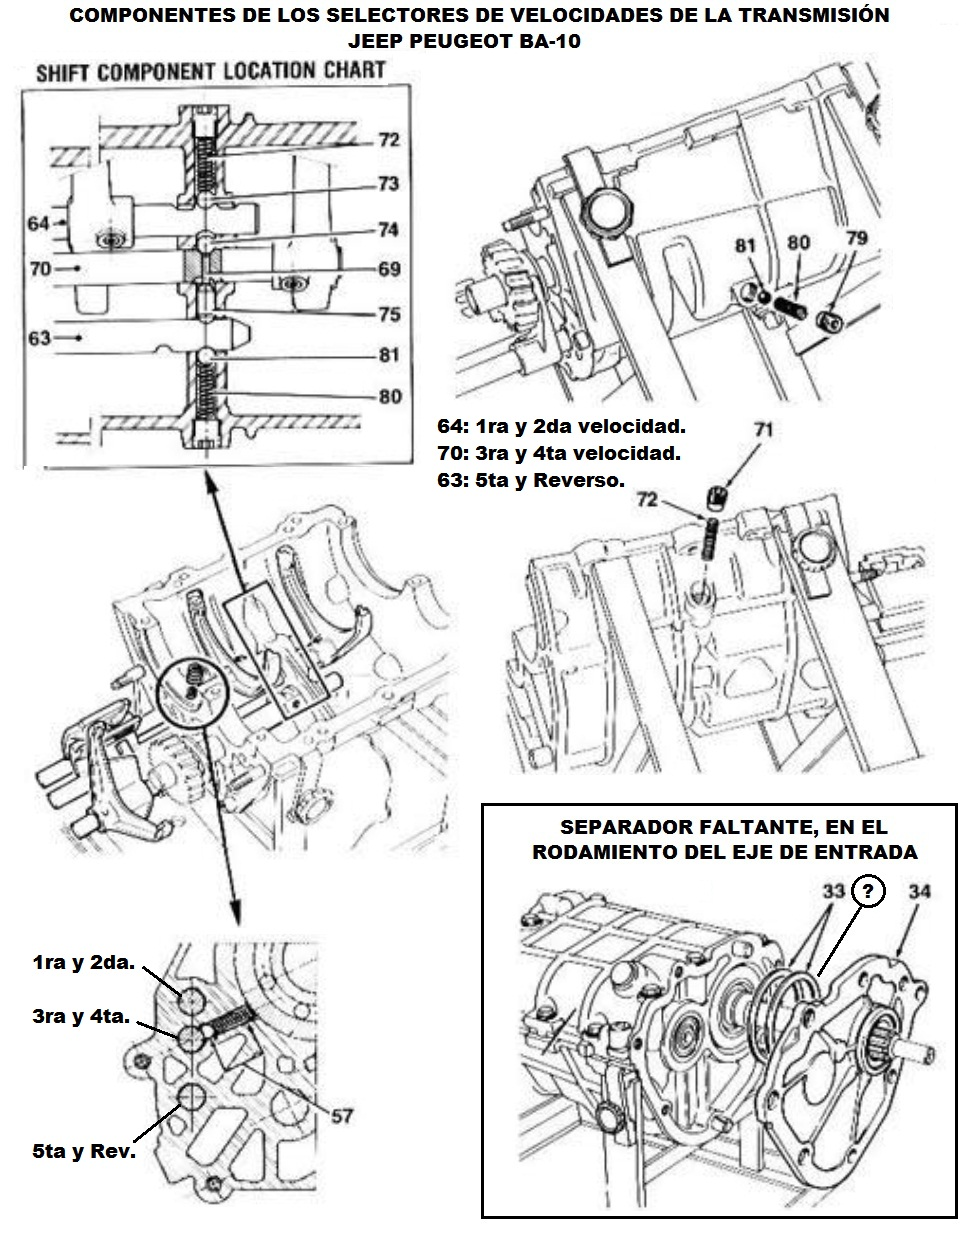 Transmission-Jeep-Peugeot-BA-10